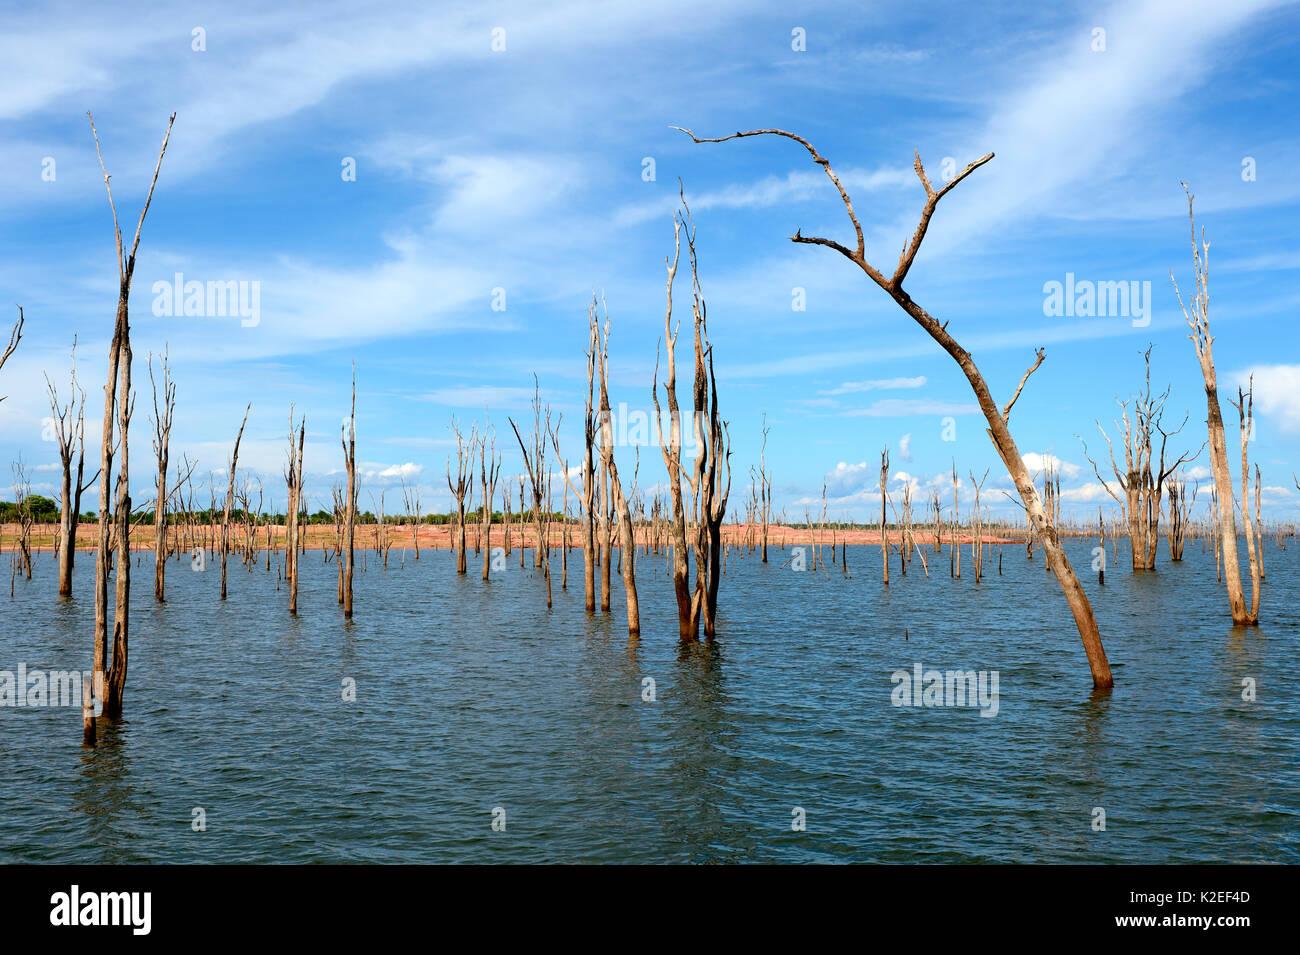 Dead Mopane trees (Colophospermum mopane) partially submerged in Lake Kariba, Matusadona National Park, Zimbabwe - Stock Image